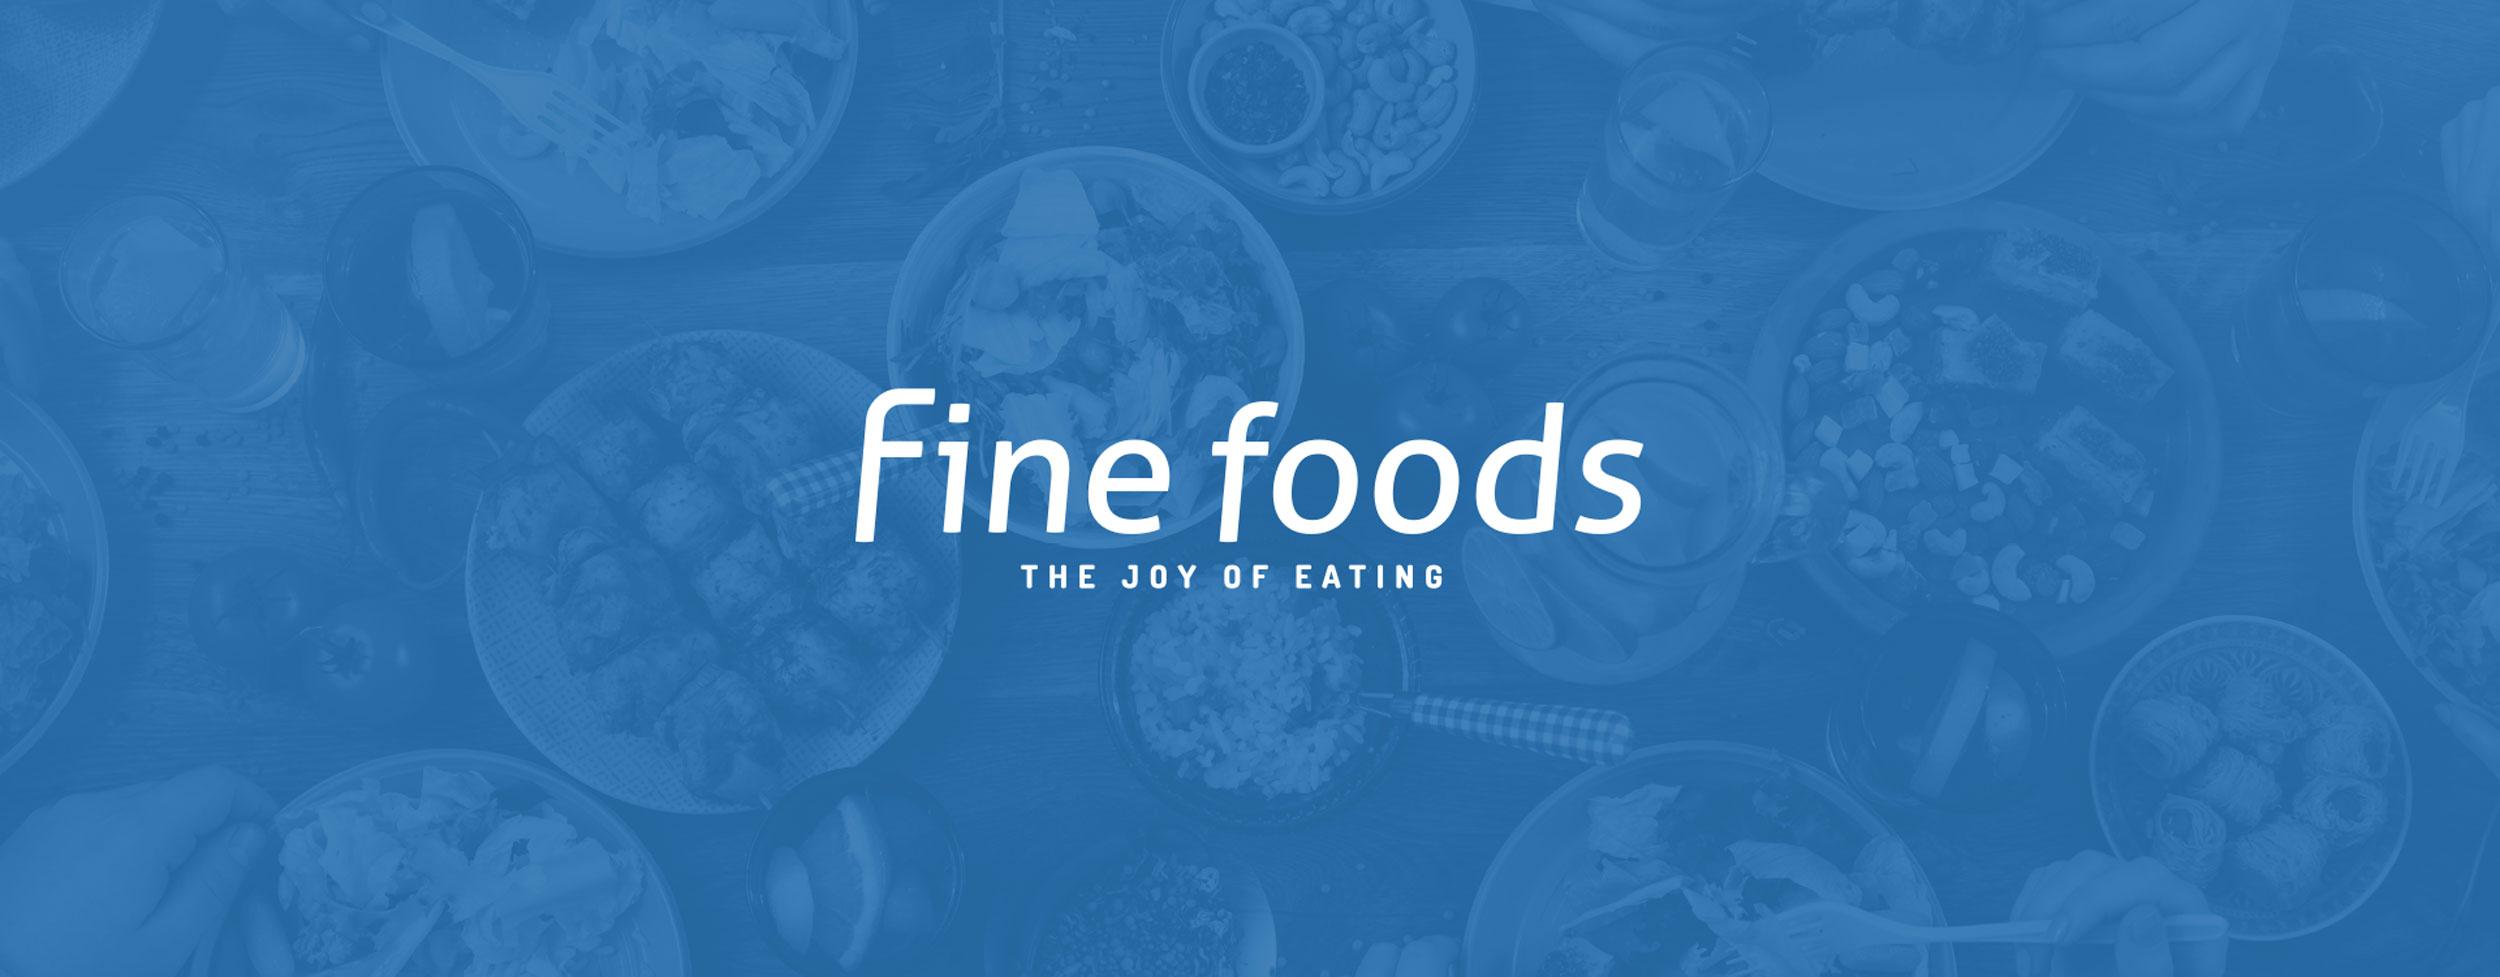 company rebrand fine foods